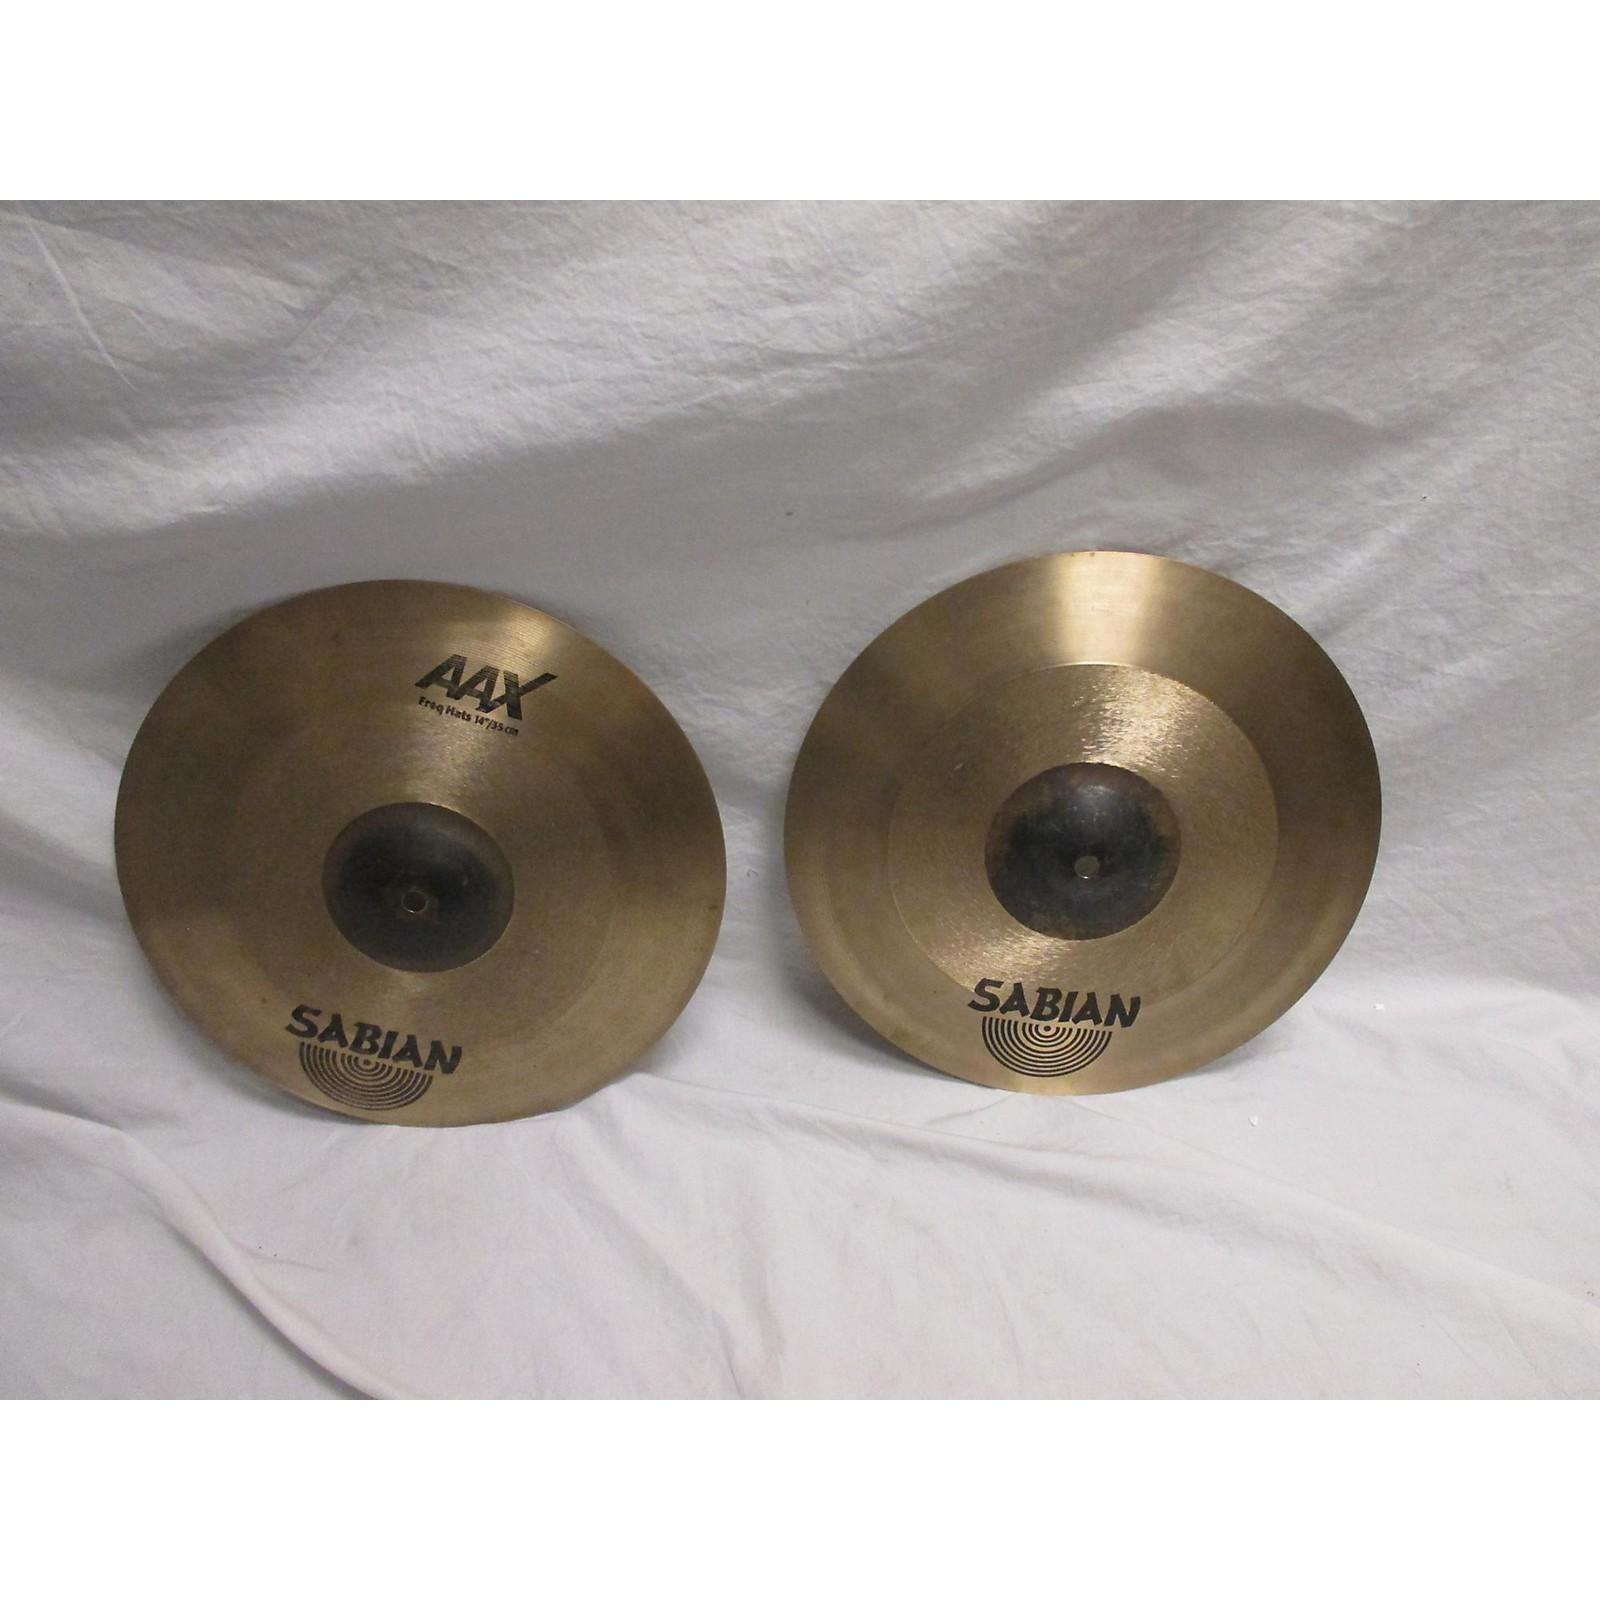 Sabian 14in AAX FREQUENCY HI HAT PAIR Cymbal